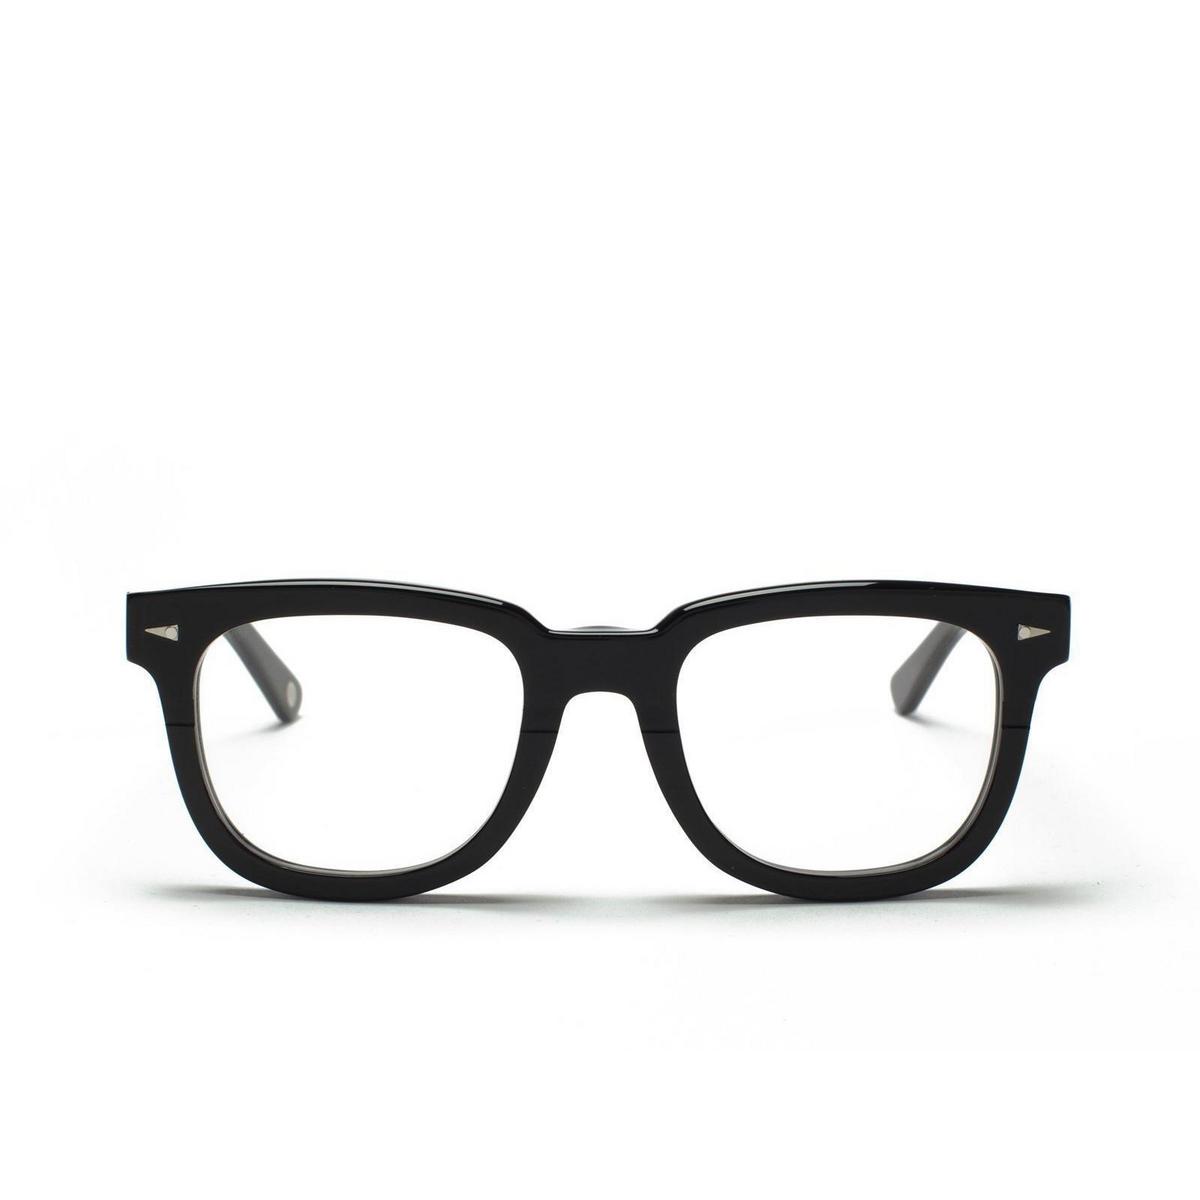 Ahlem® Square Eyeglasses: Square Du Temple Optic color Black.